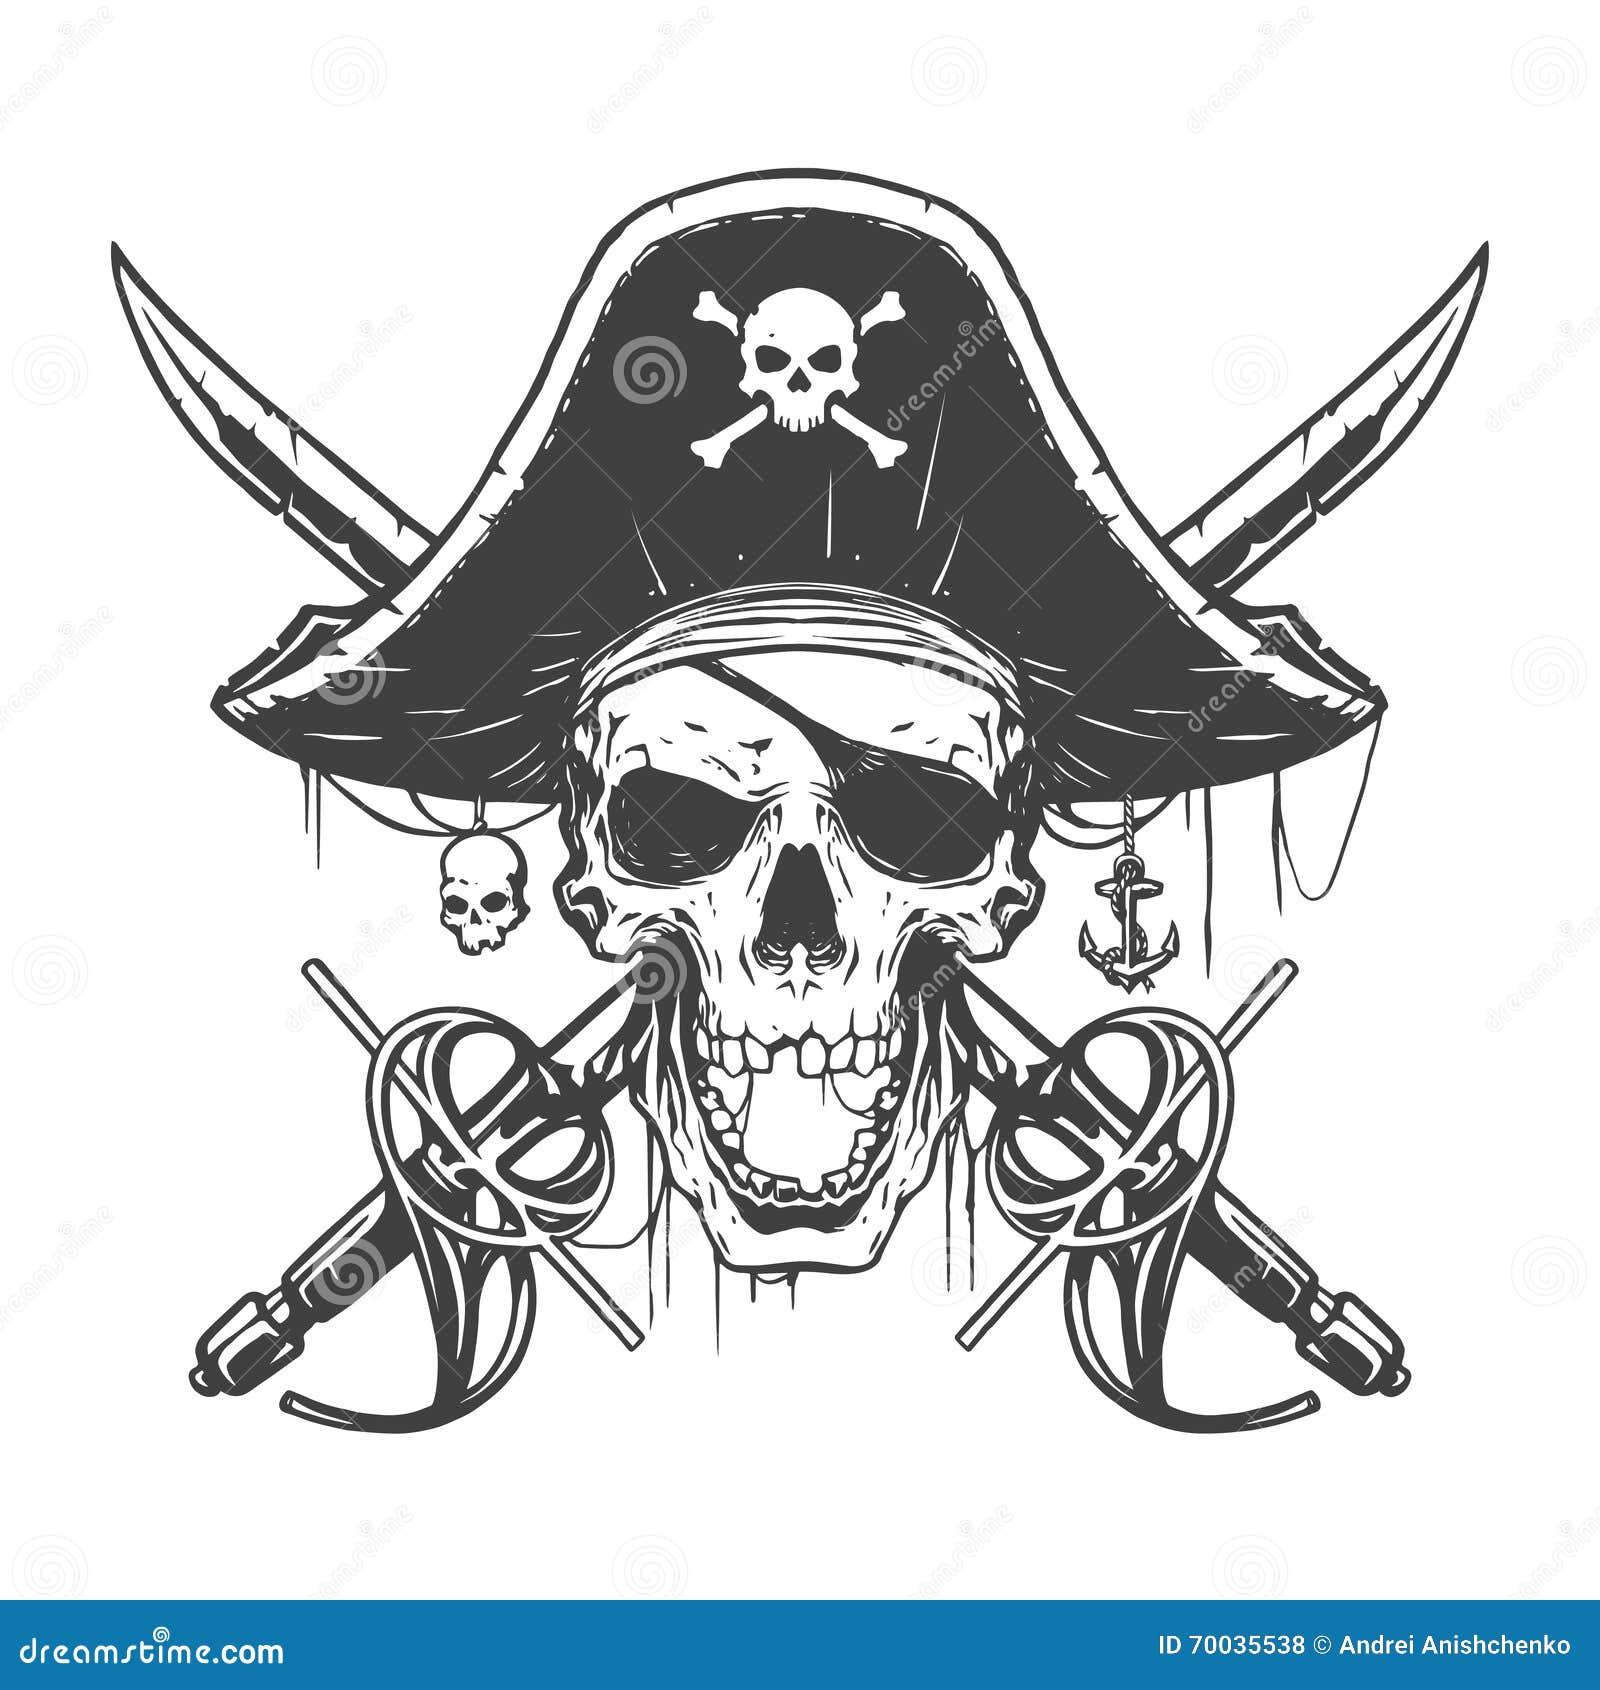 Skull Pirate Illustration Stock Vector - Image: 70035538